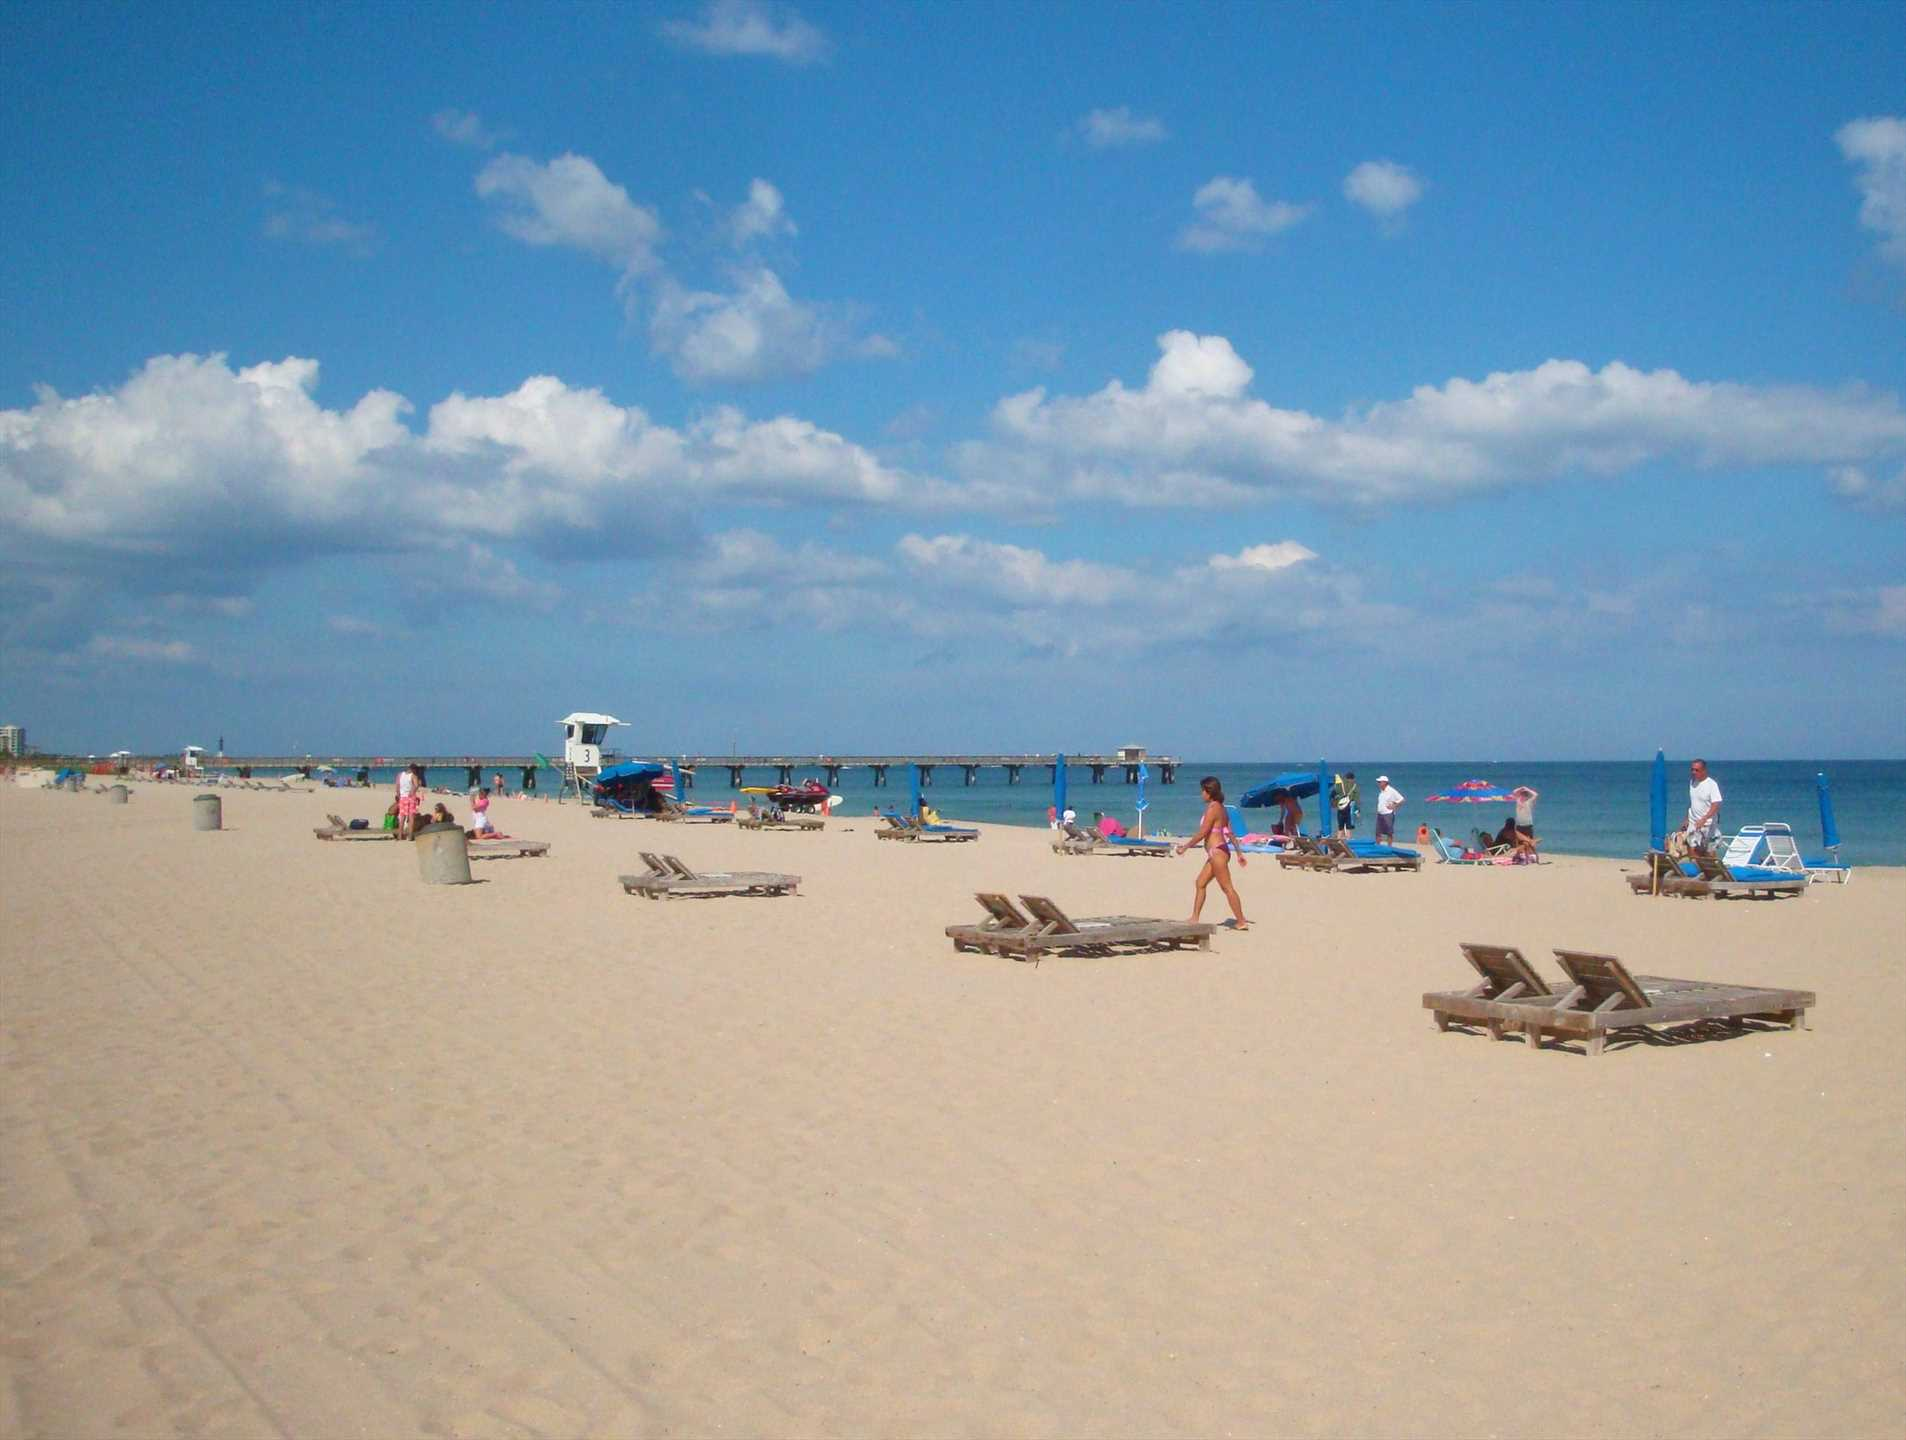 Stroll down the Pompano Beach fishing pier or enjoy the sand